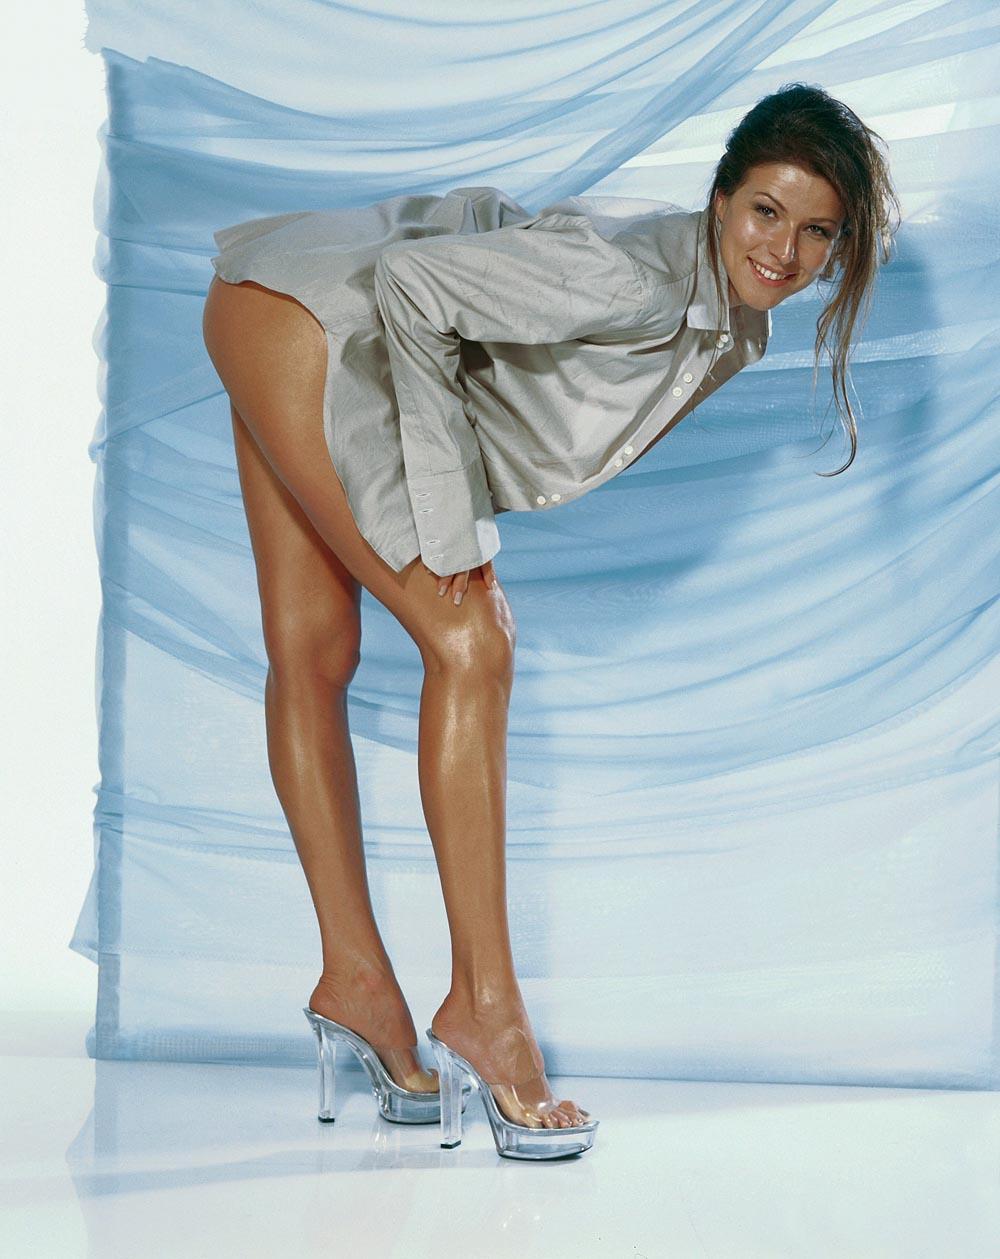 Леонора Капелль голая. Фото - 2